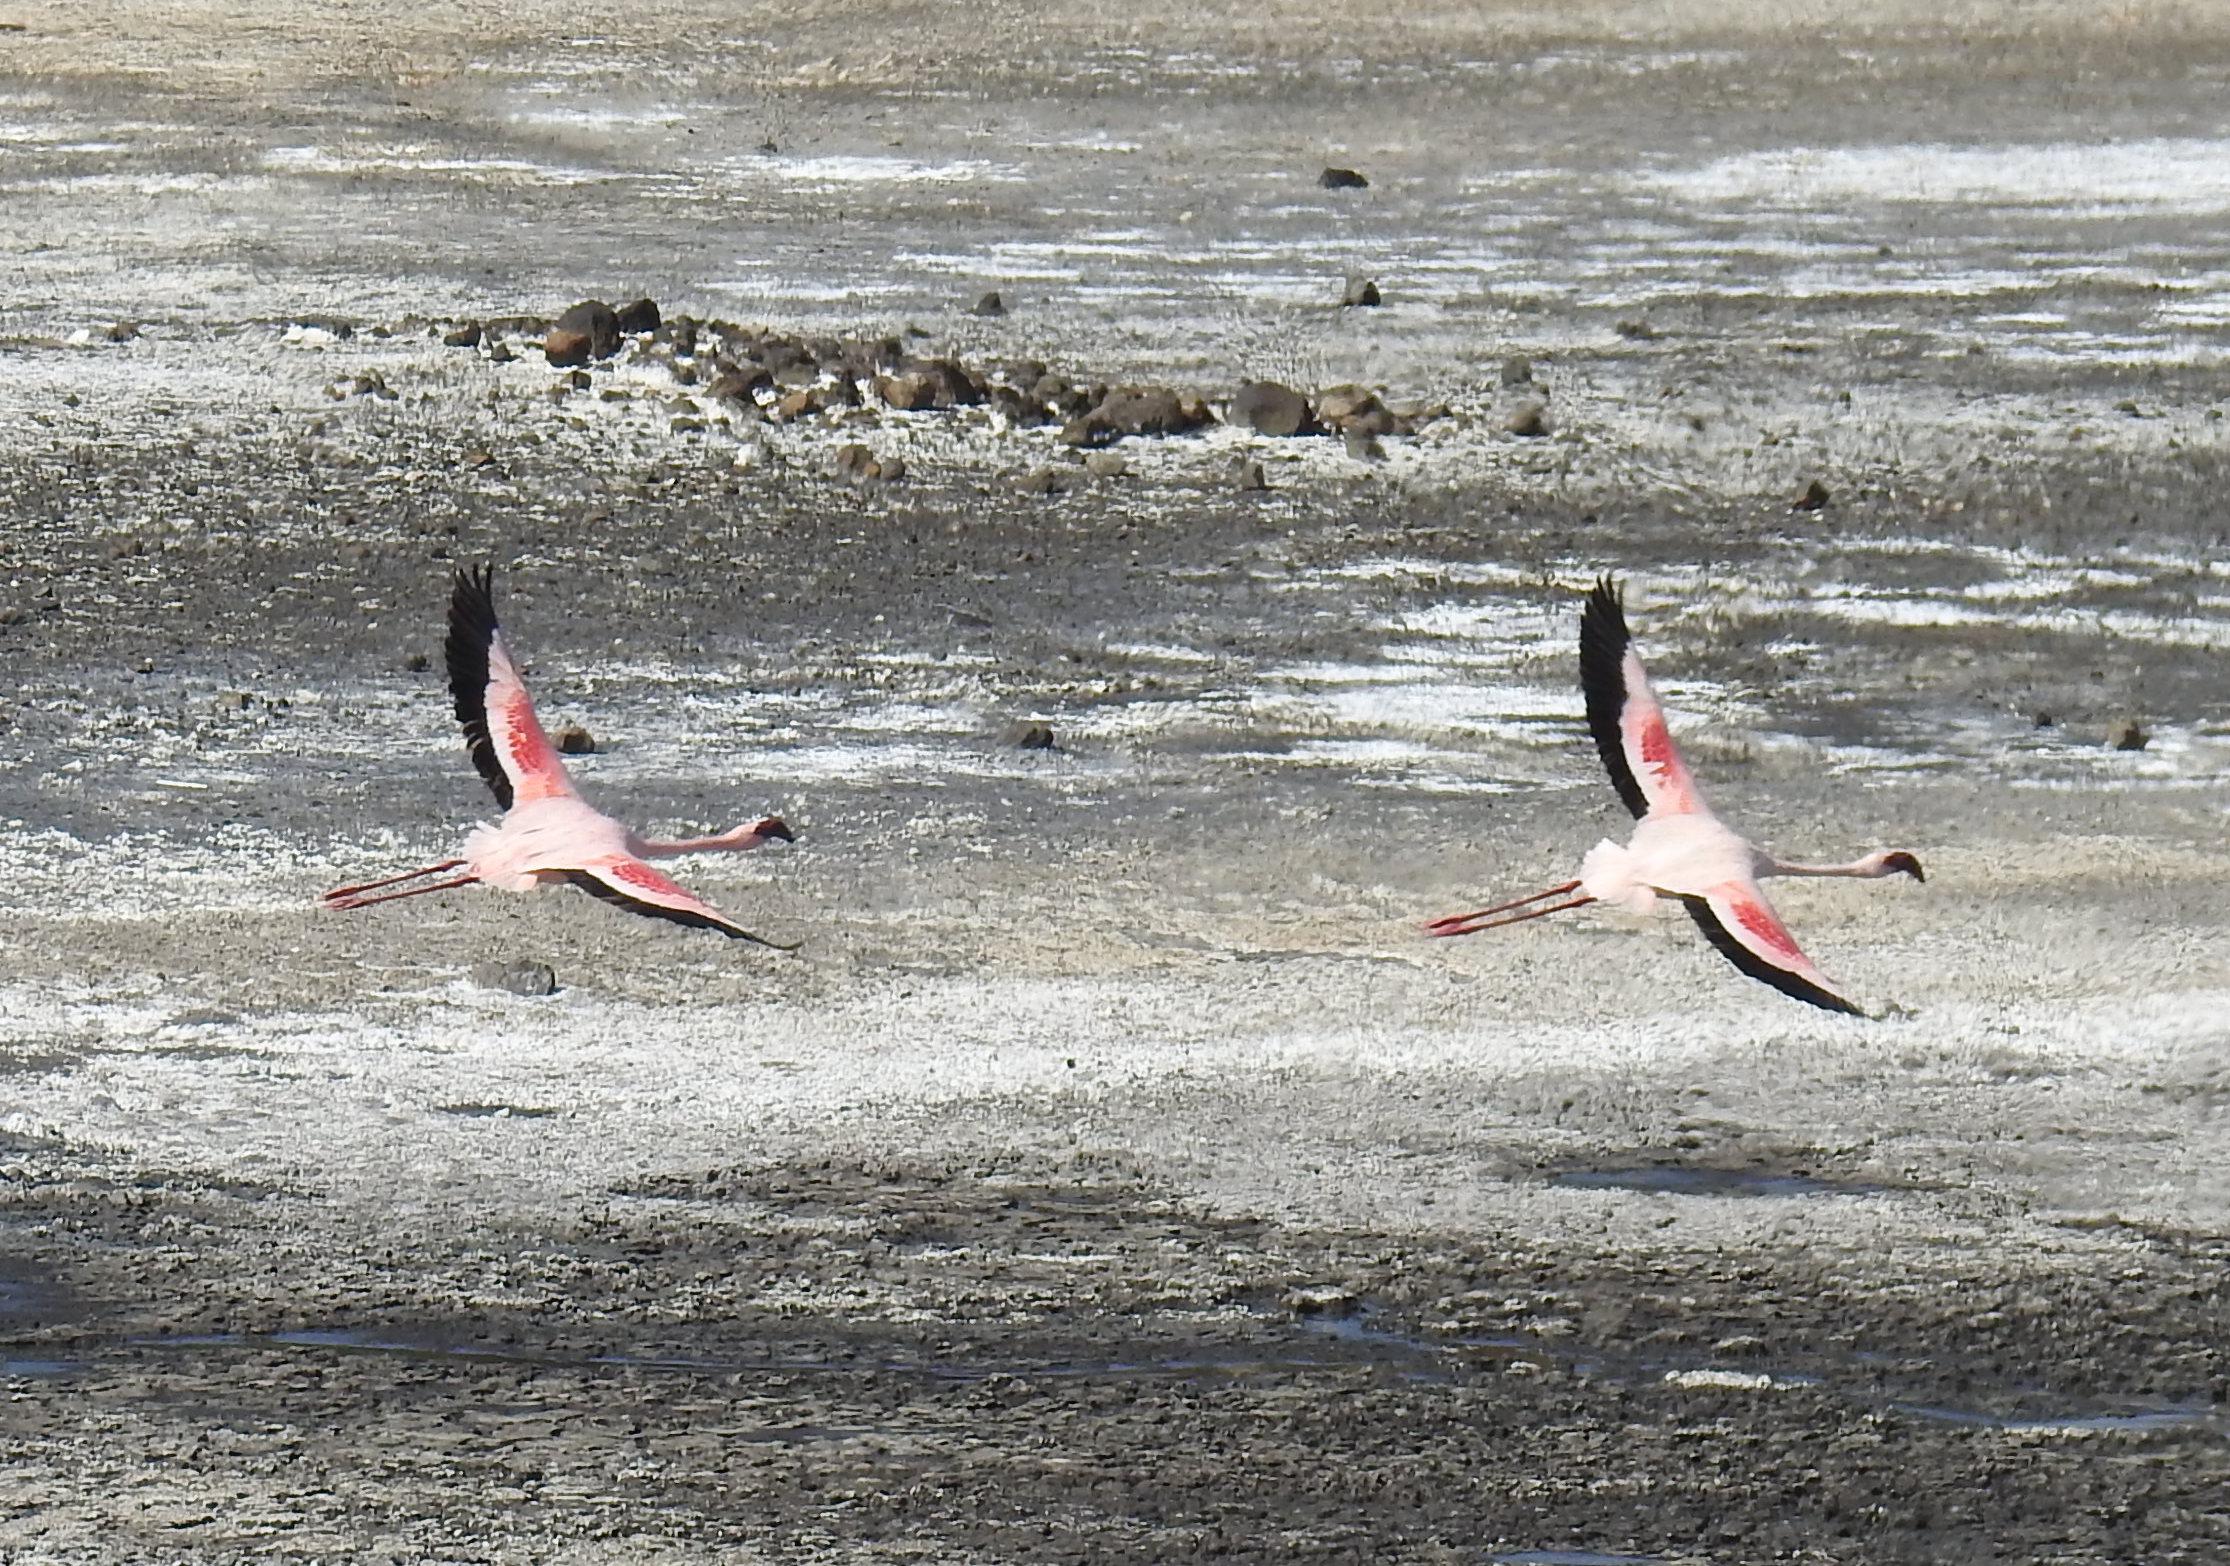 Flamingos_flying.jpg